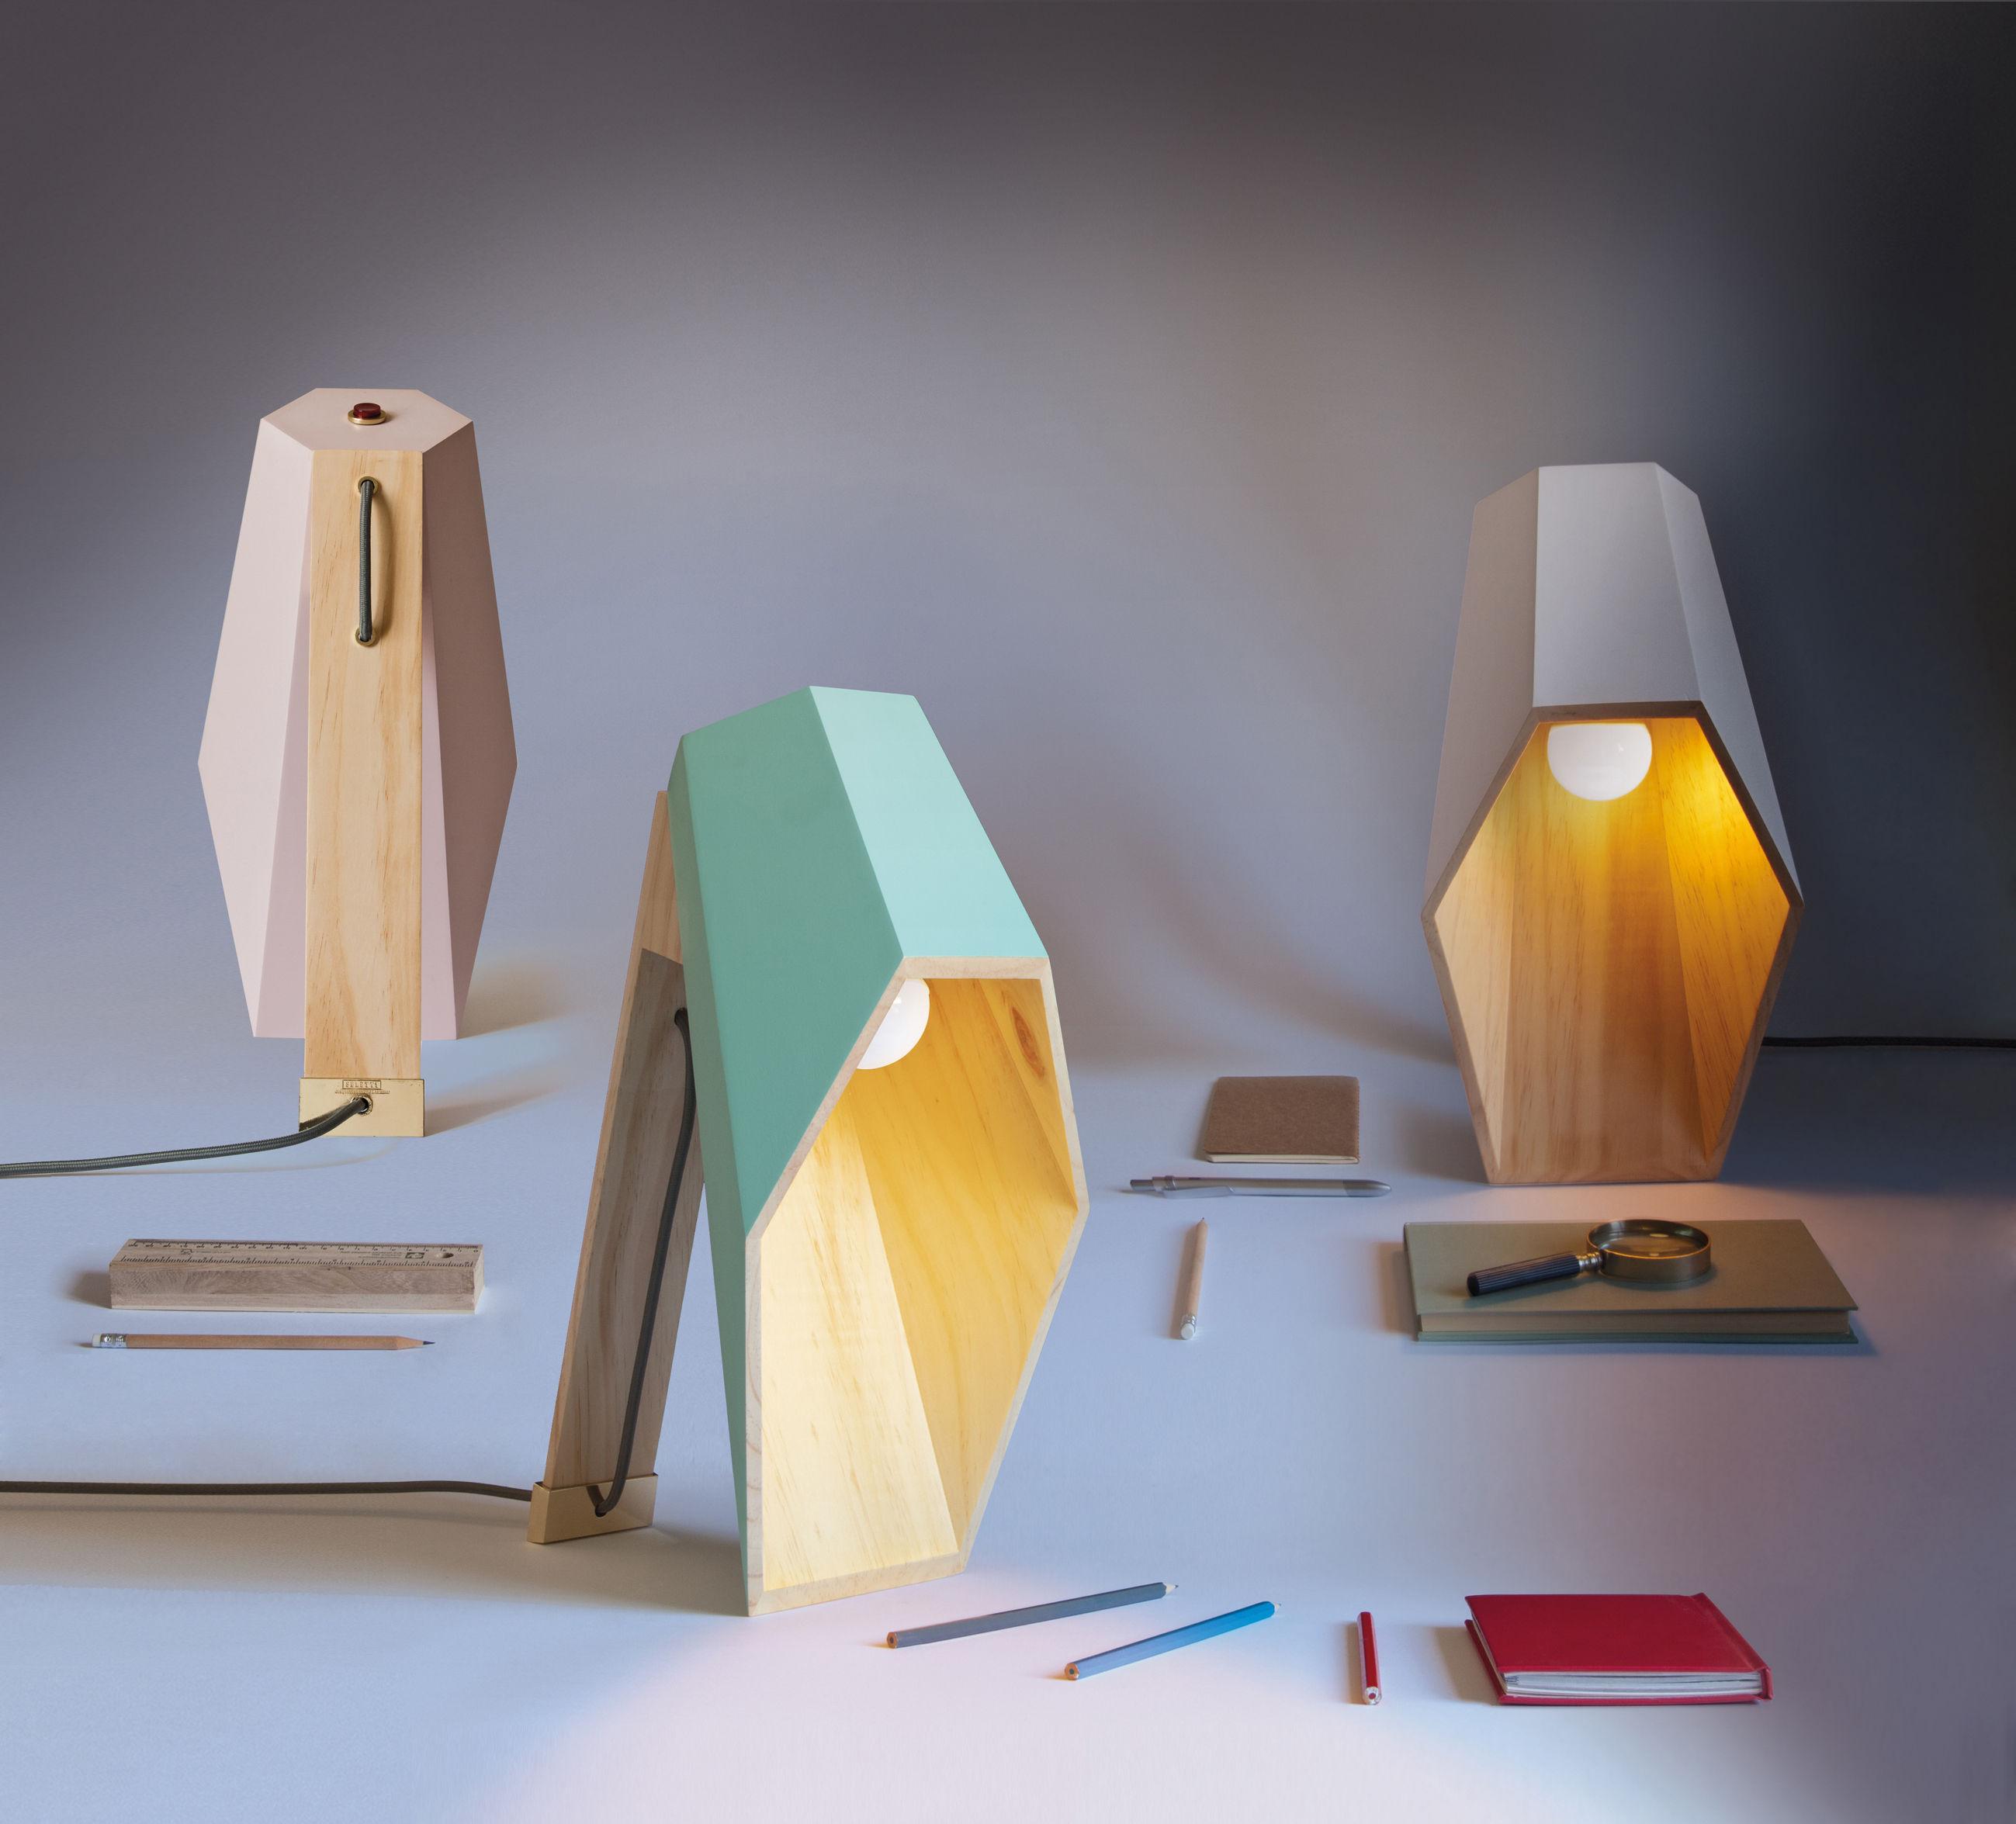 lampe de table woodspot led h 44 cm blanc seletti. Black Bedroom Furniture Sets. Home Design Ideas